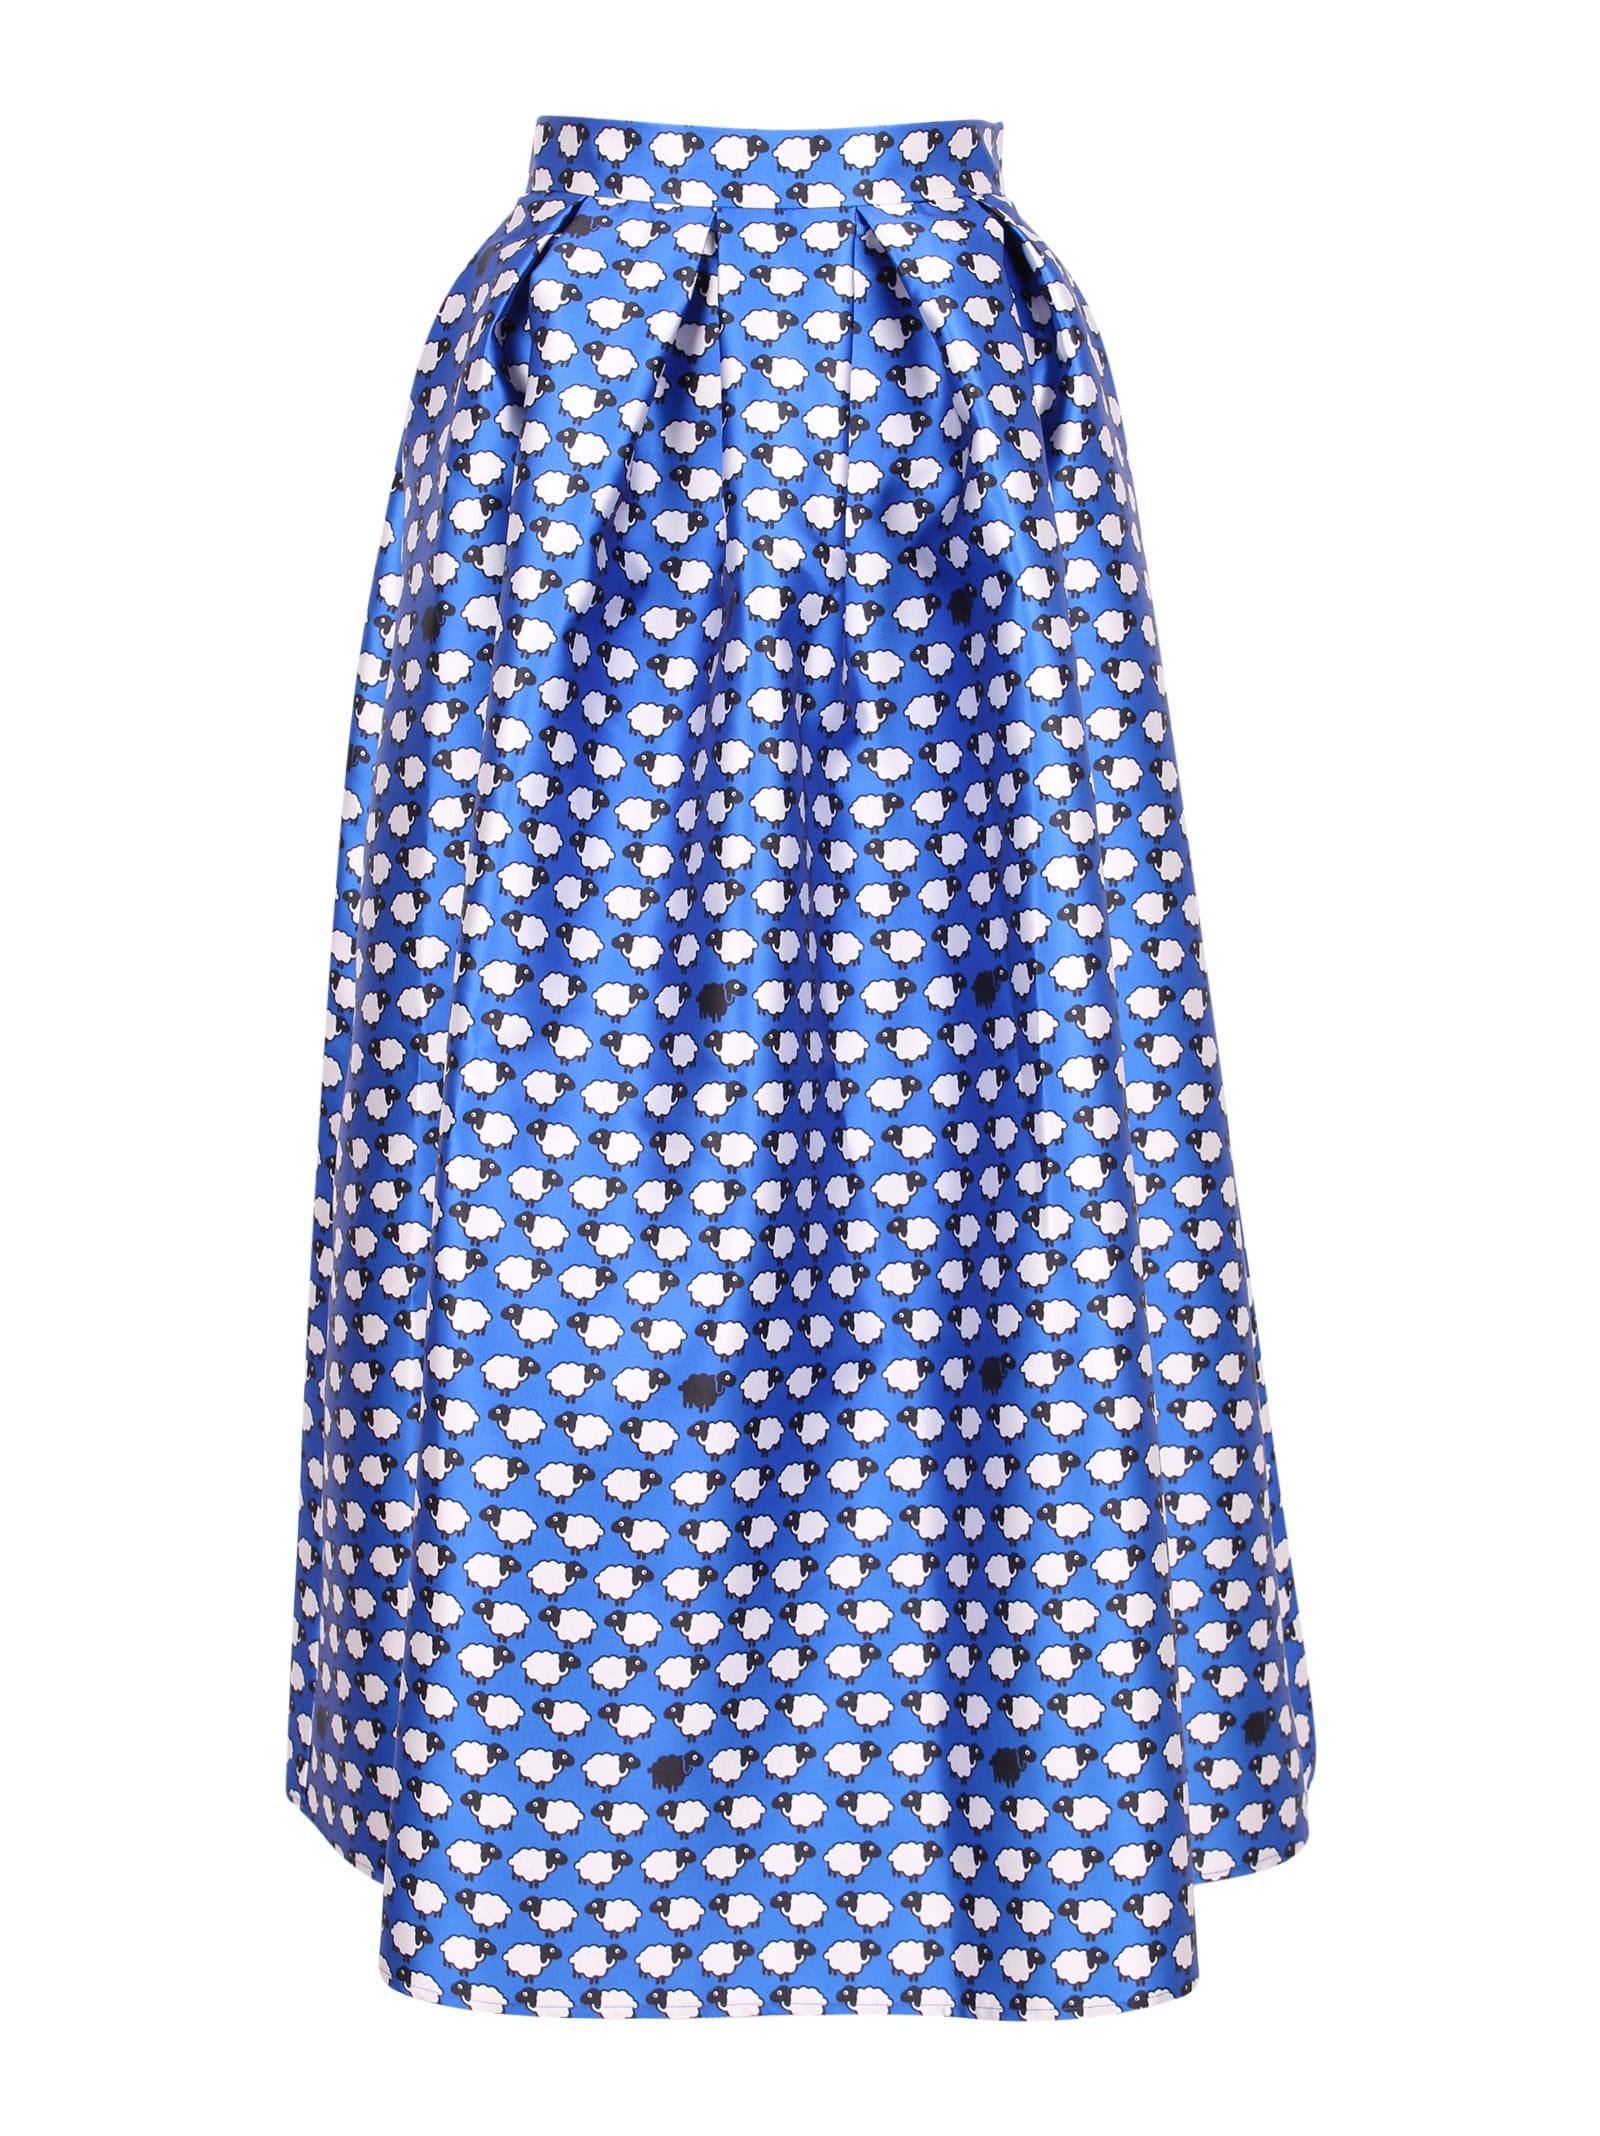 Alessandro Enriquez Sheep Long Skirt In Blue